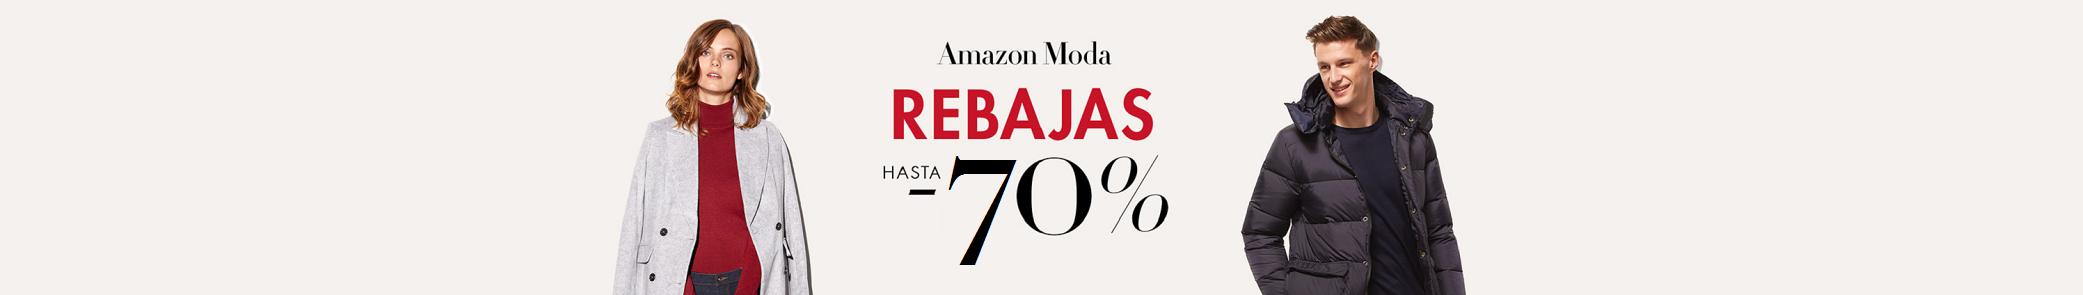 REBAJAS MODA